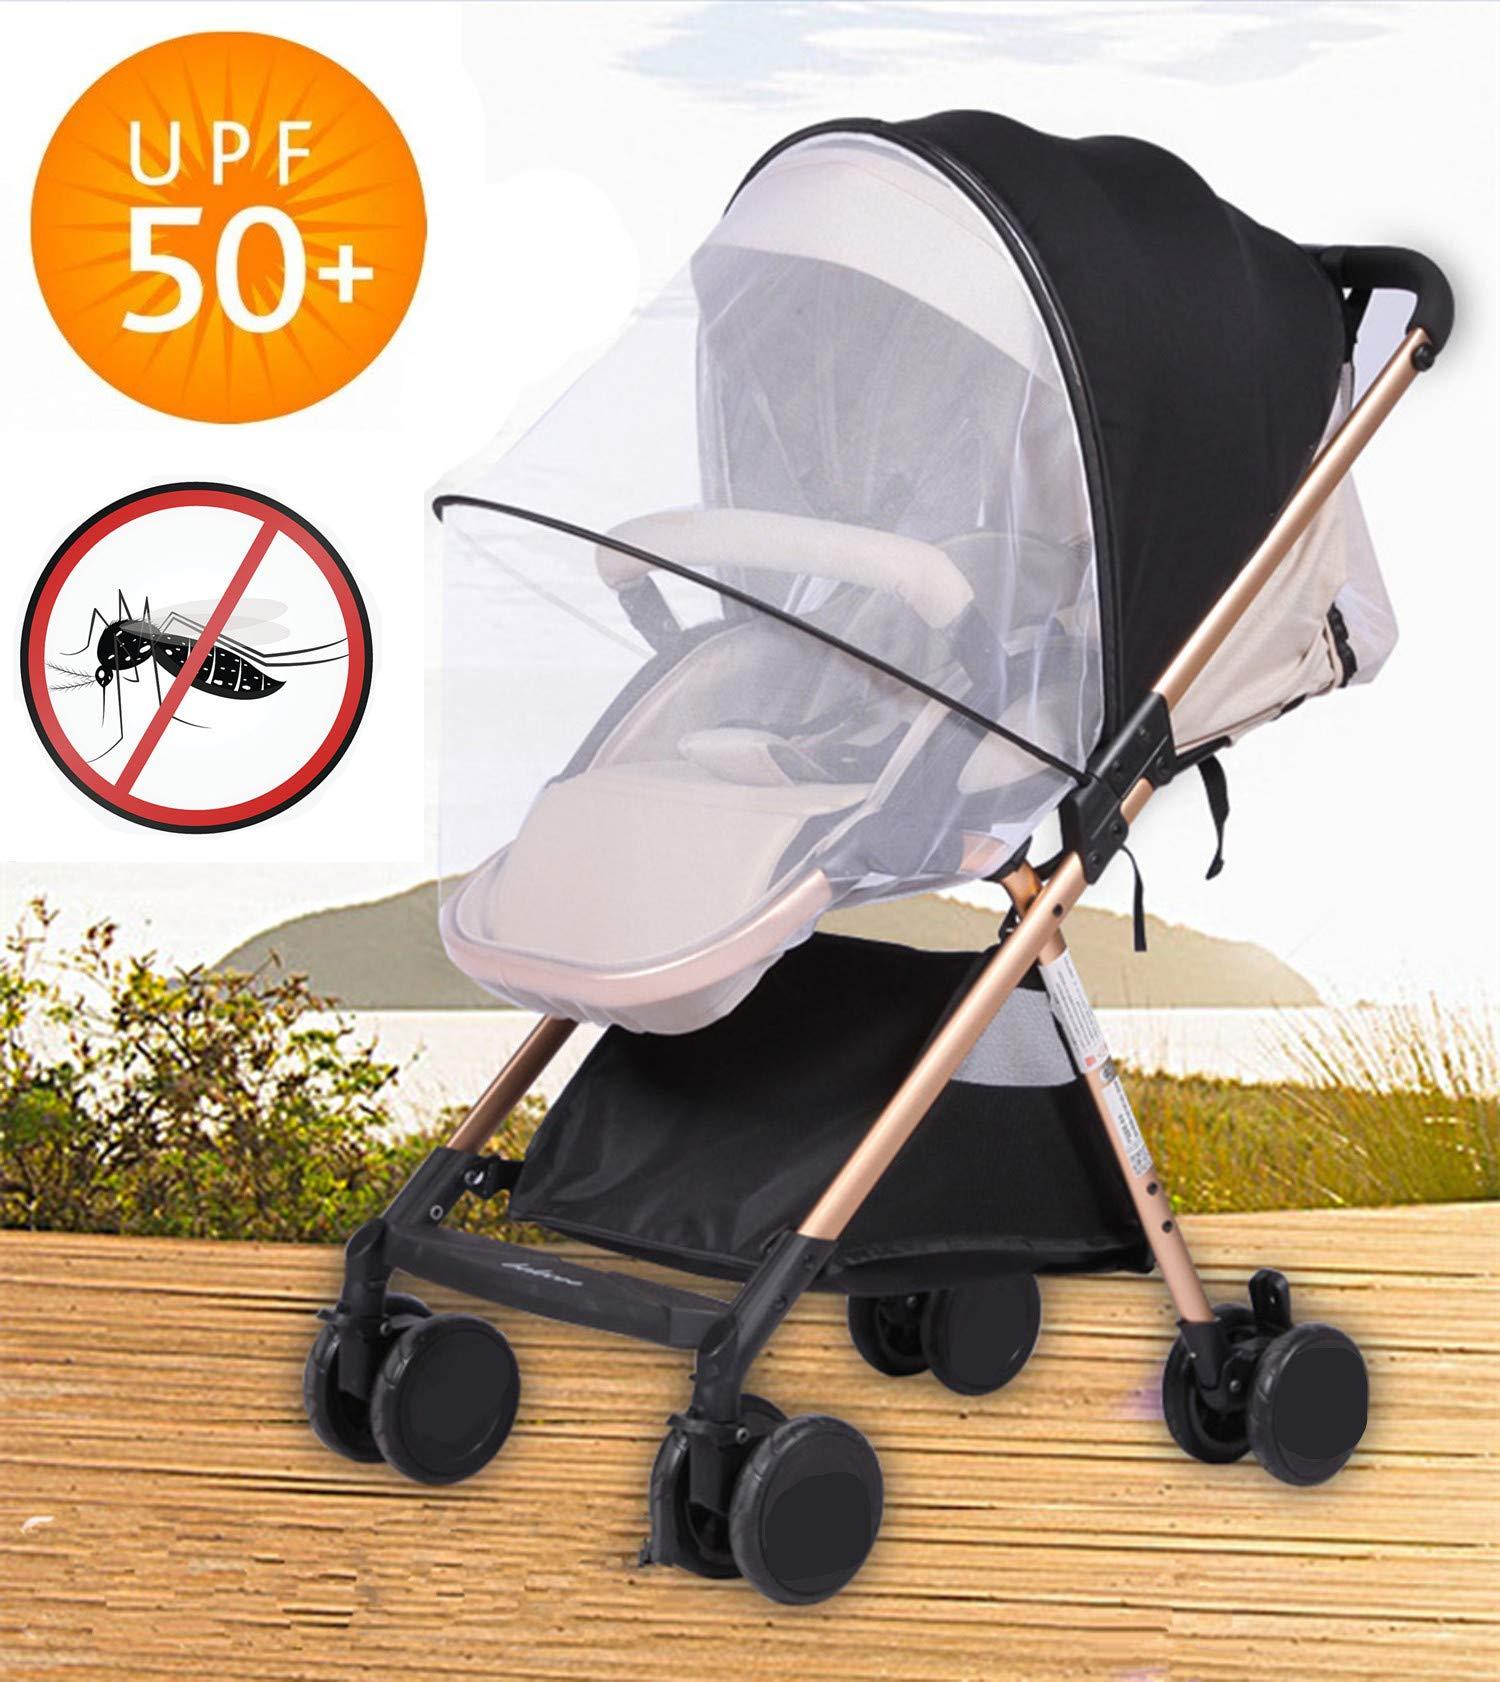 Sun Shade Stroller Car Seat Sunshade Bassinet Playpen Crib Stroller Net-Nice Visiblity and Air Permeability Design (Black + Sunshade)